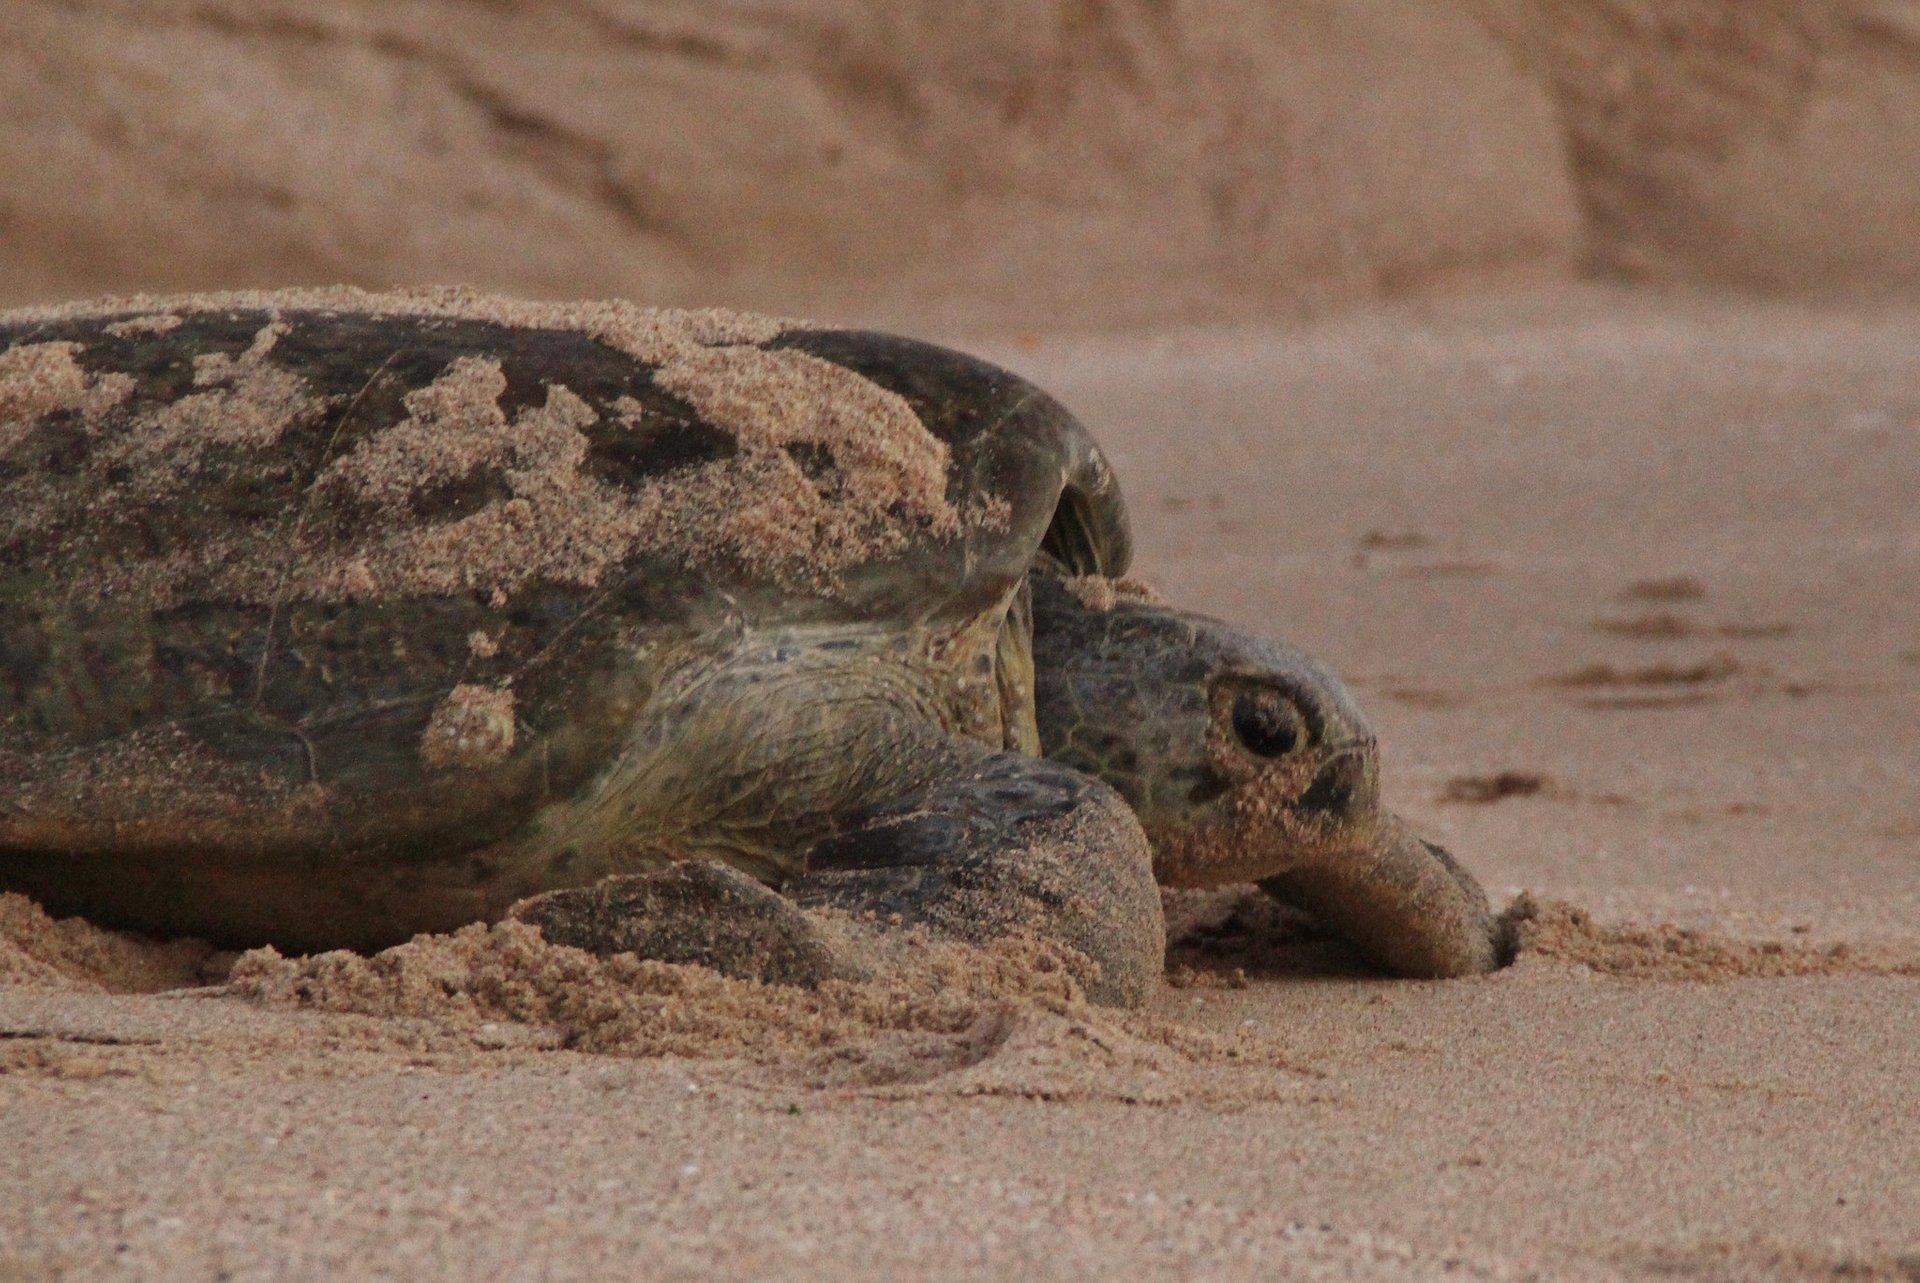 Turtle at Ras Al Hadd